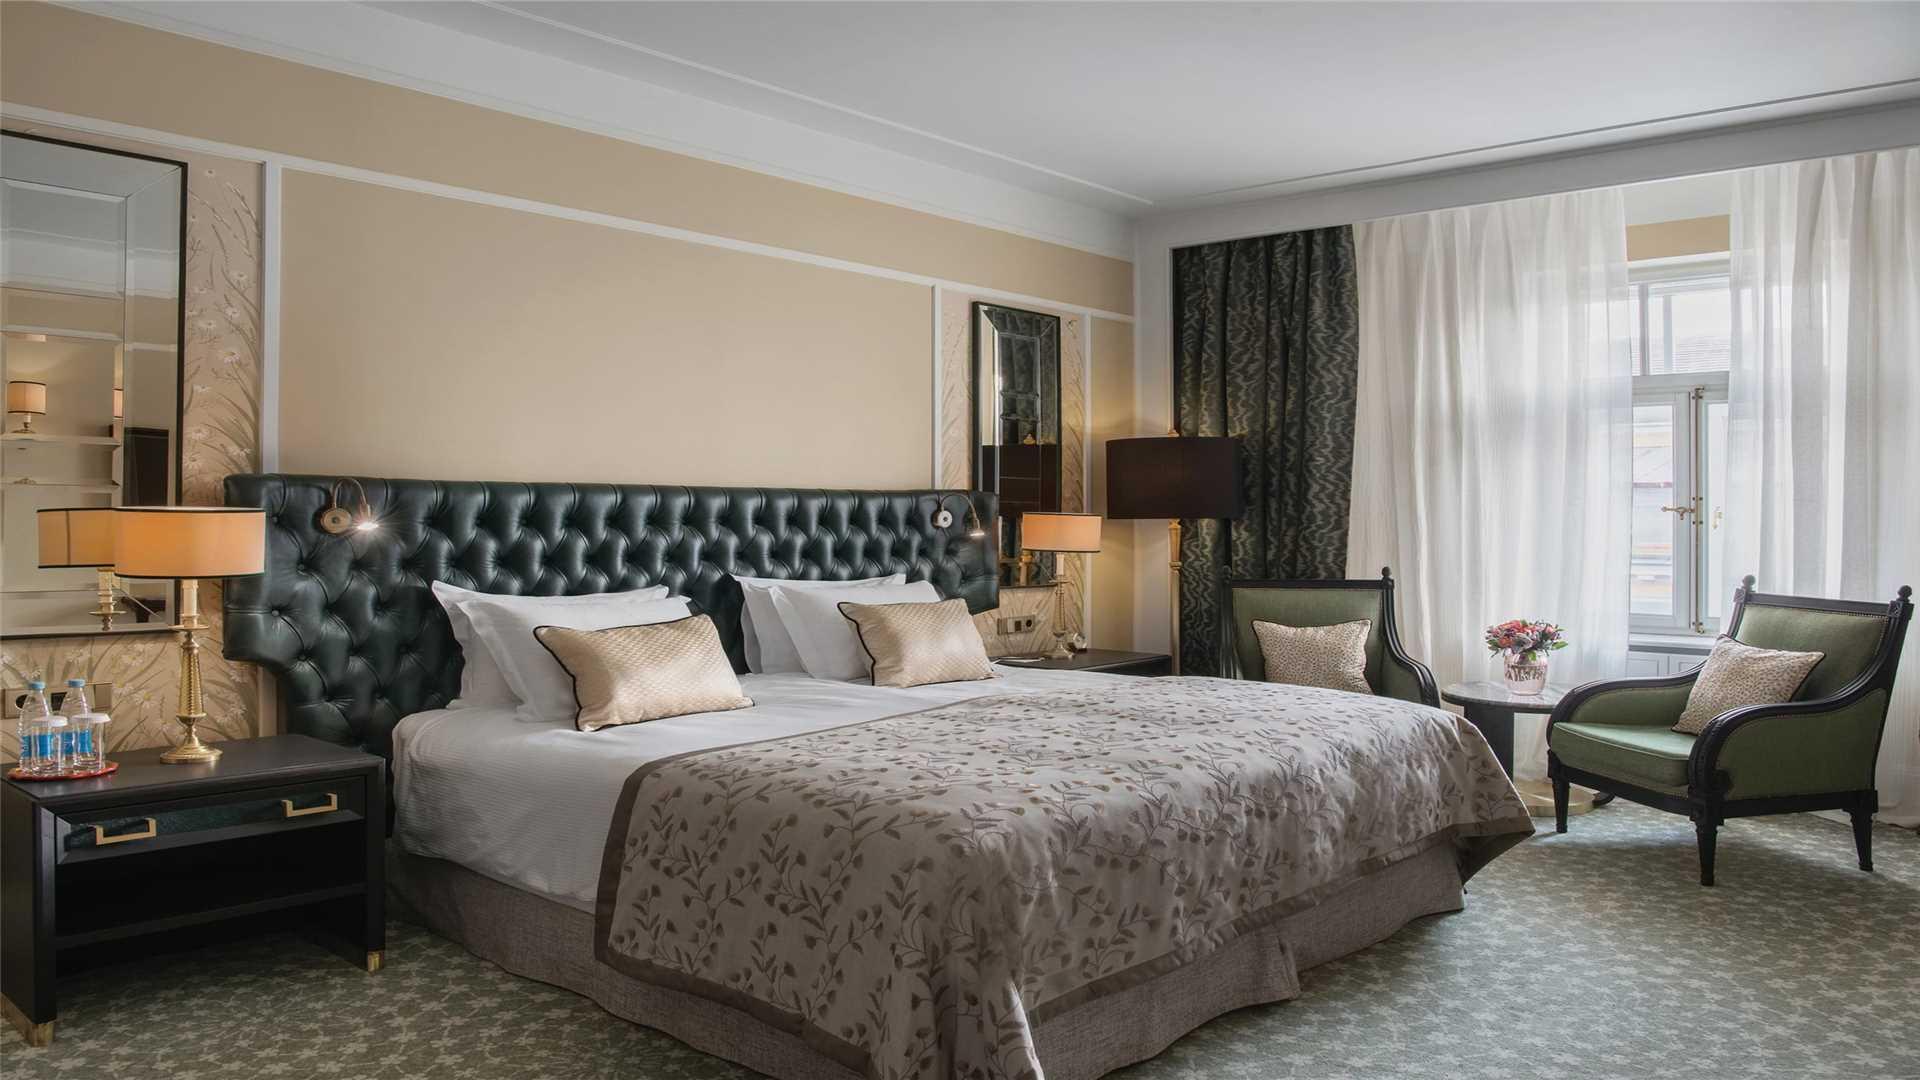 Belmond Grand Hotel Europe Doppelzimmer